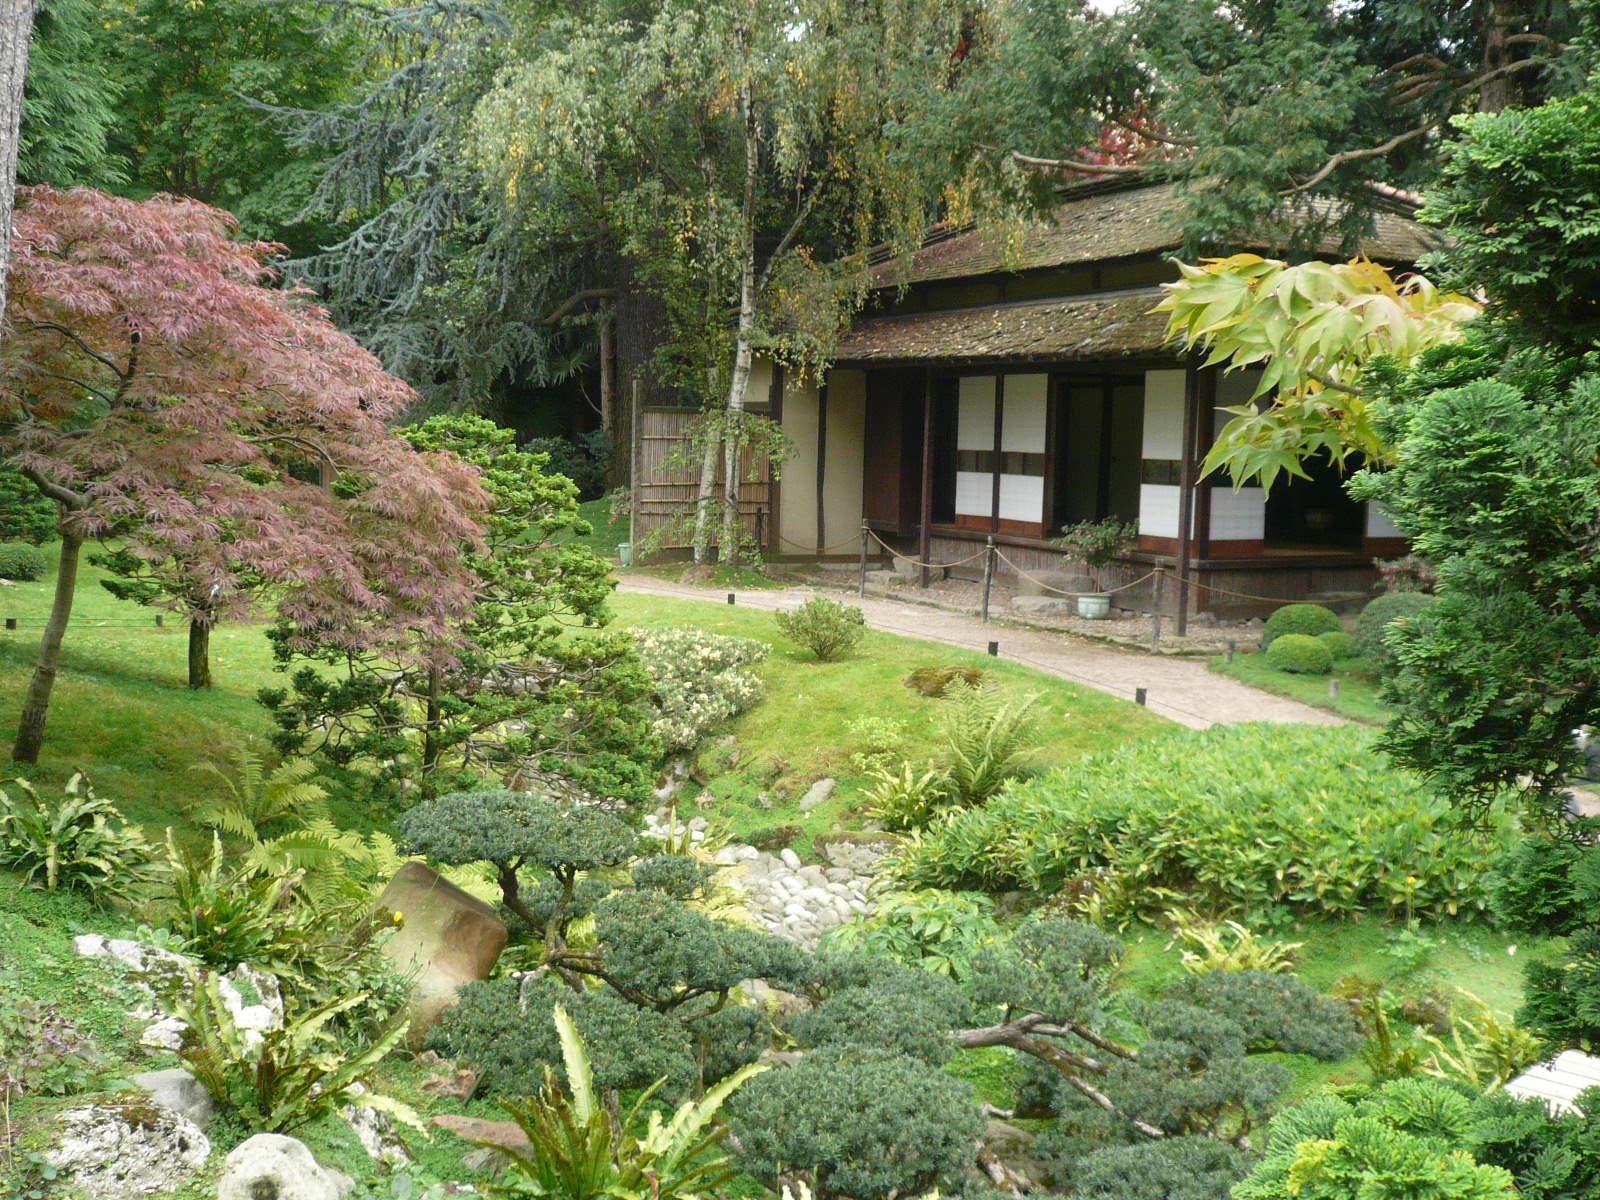 village japonais jardins albert kahn voyage balade paris